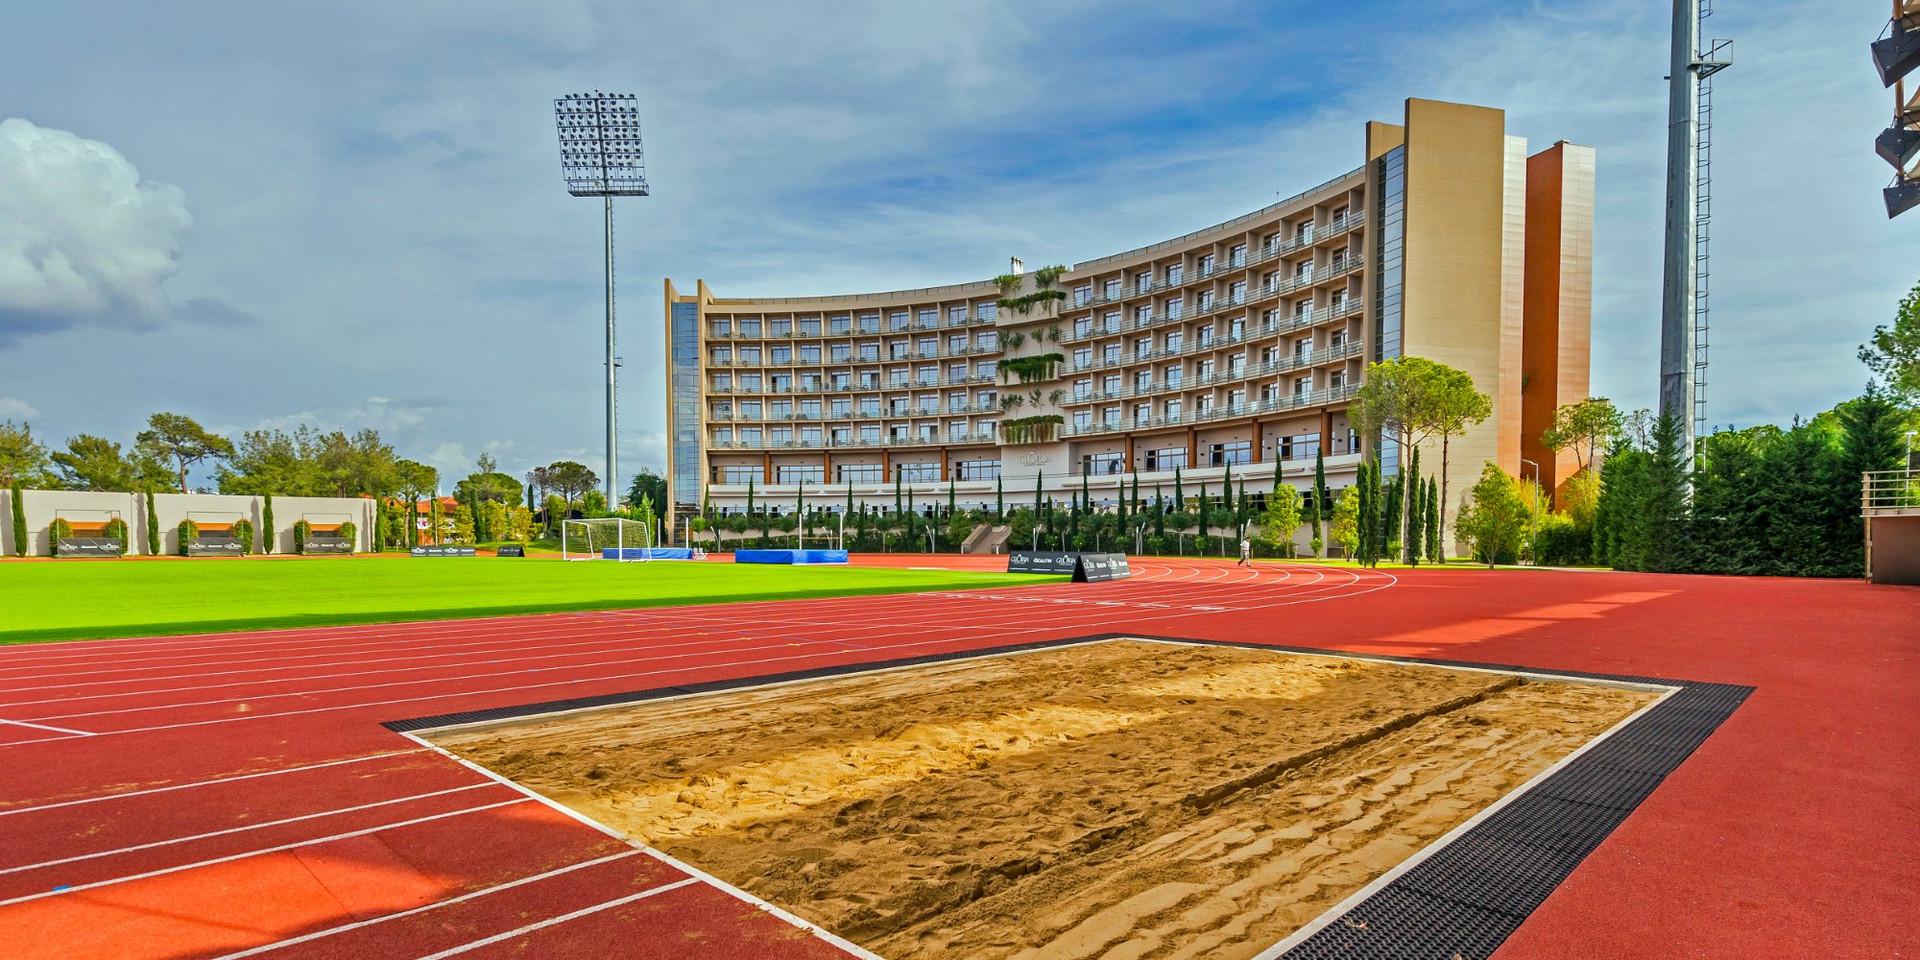 outdoor-sports-facilities (1).jpg